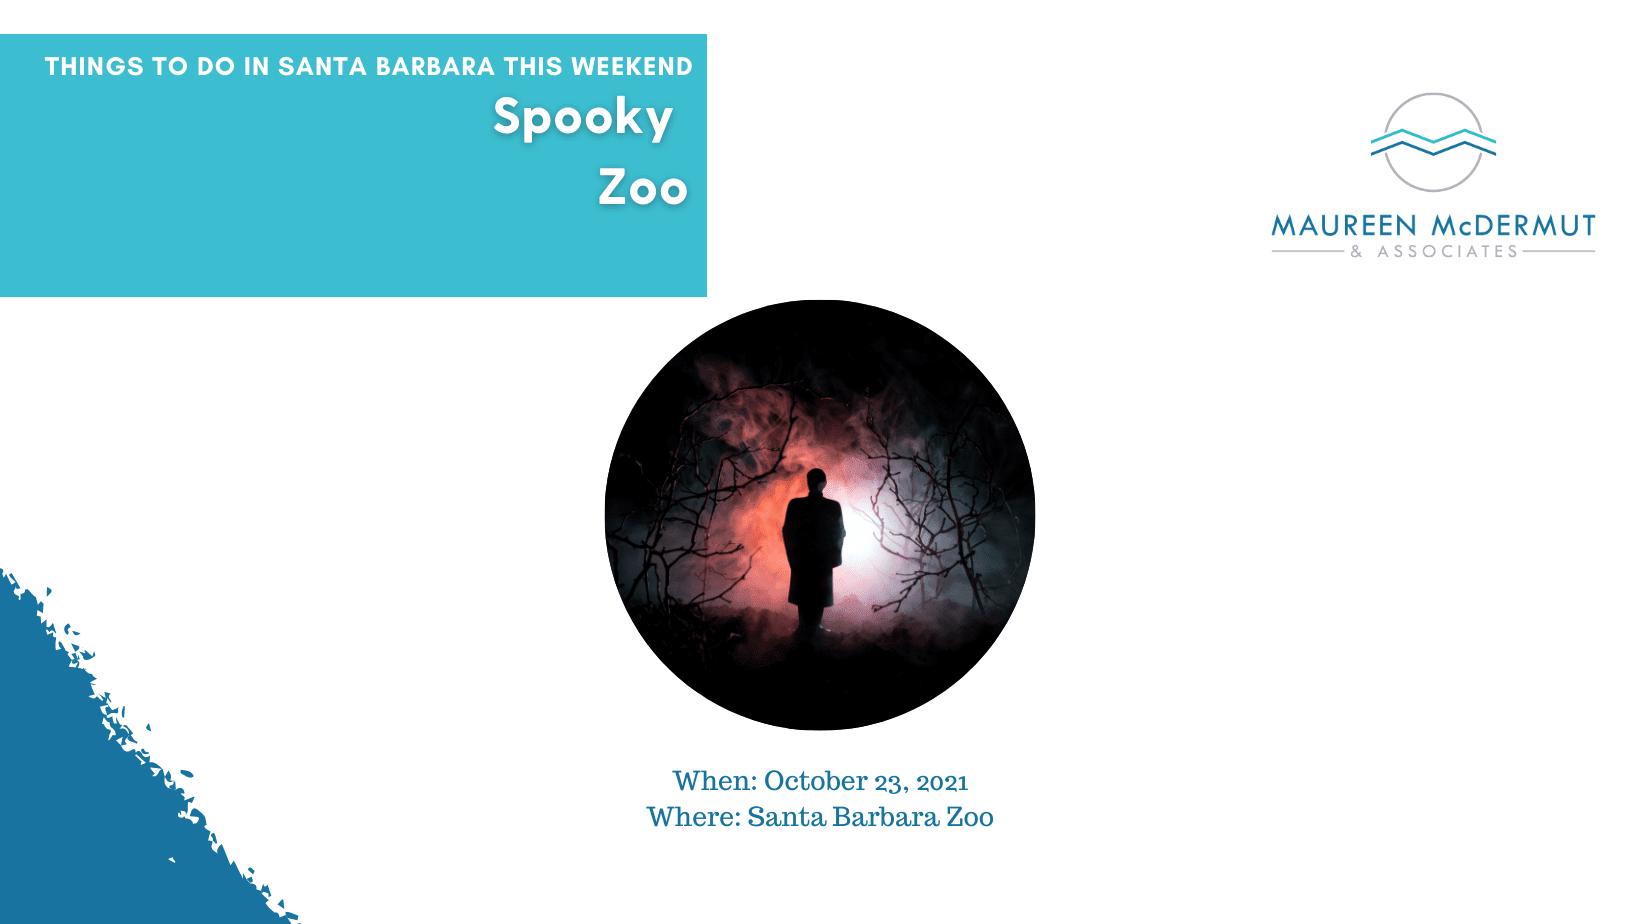 Spooky Zoo image